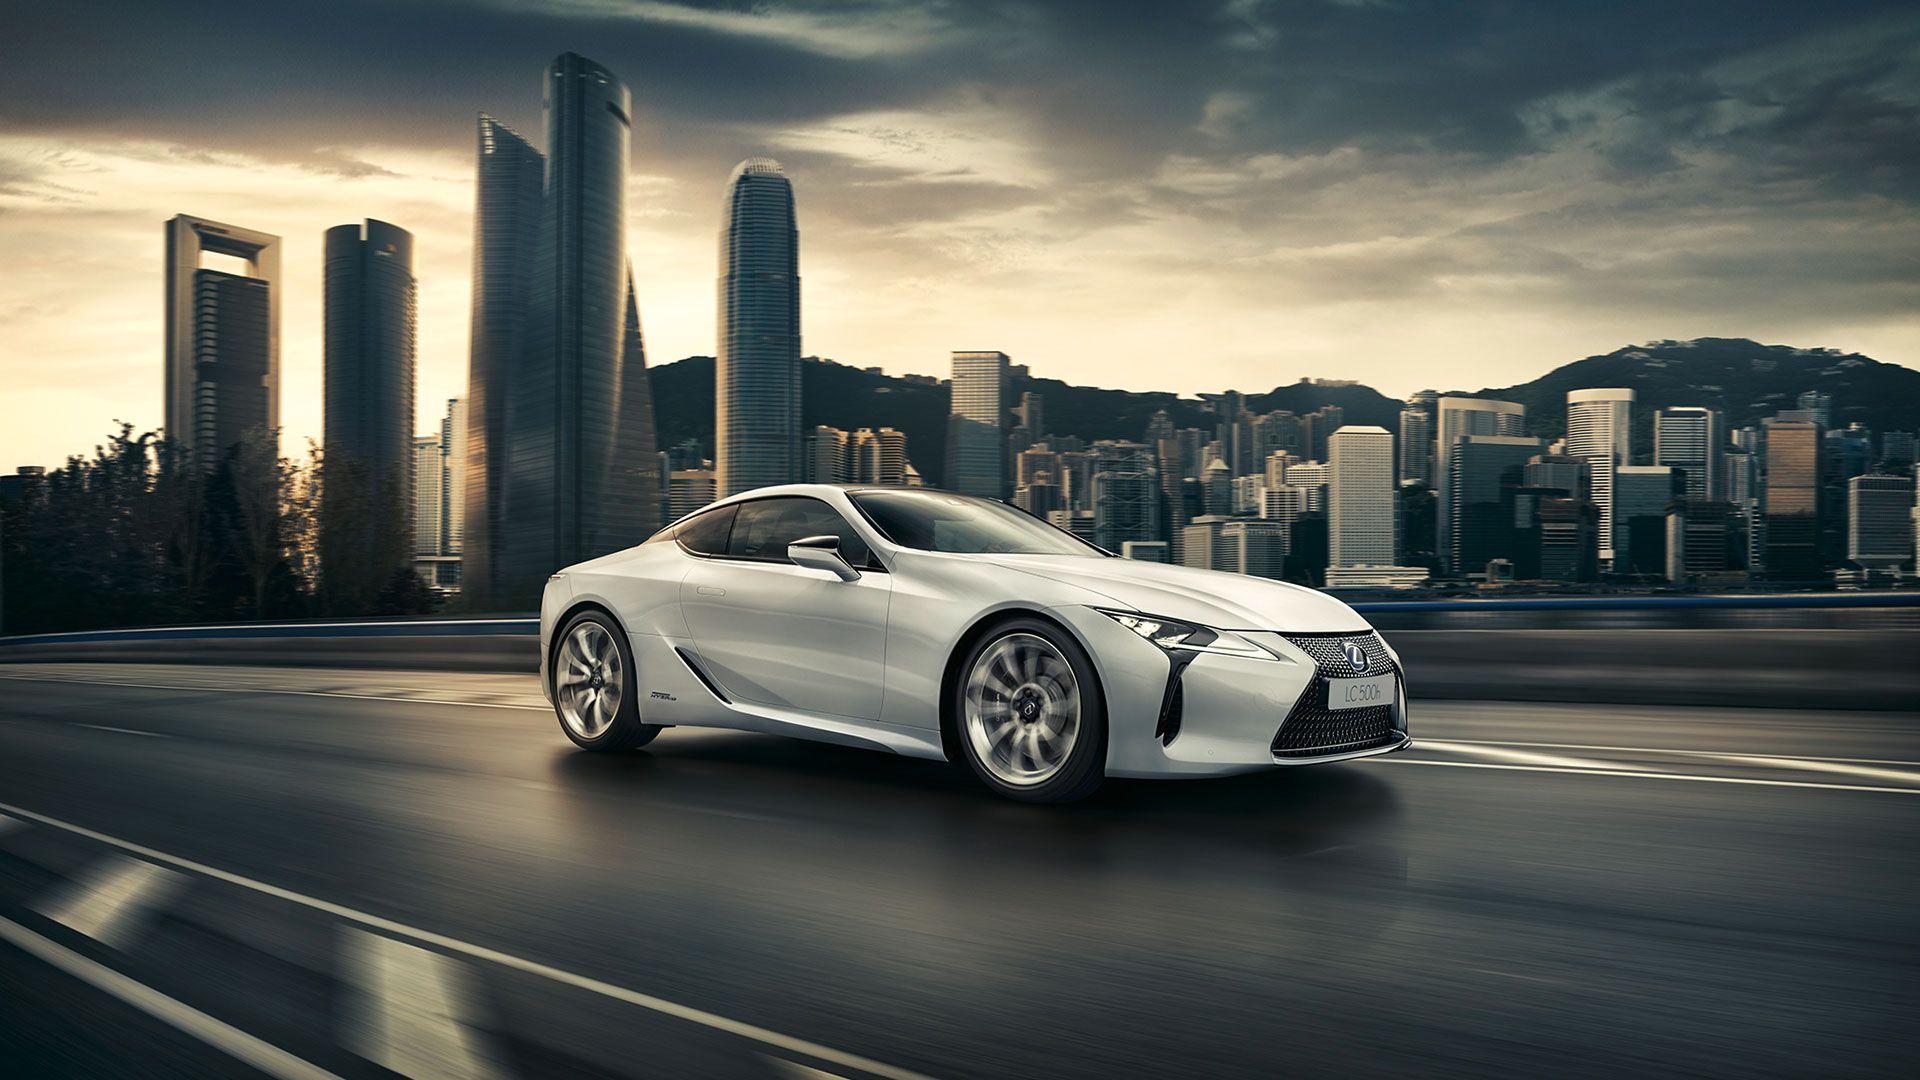 2017 Lexus LC 500h gallery 007 Lexus, Lexus lc, Instagram